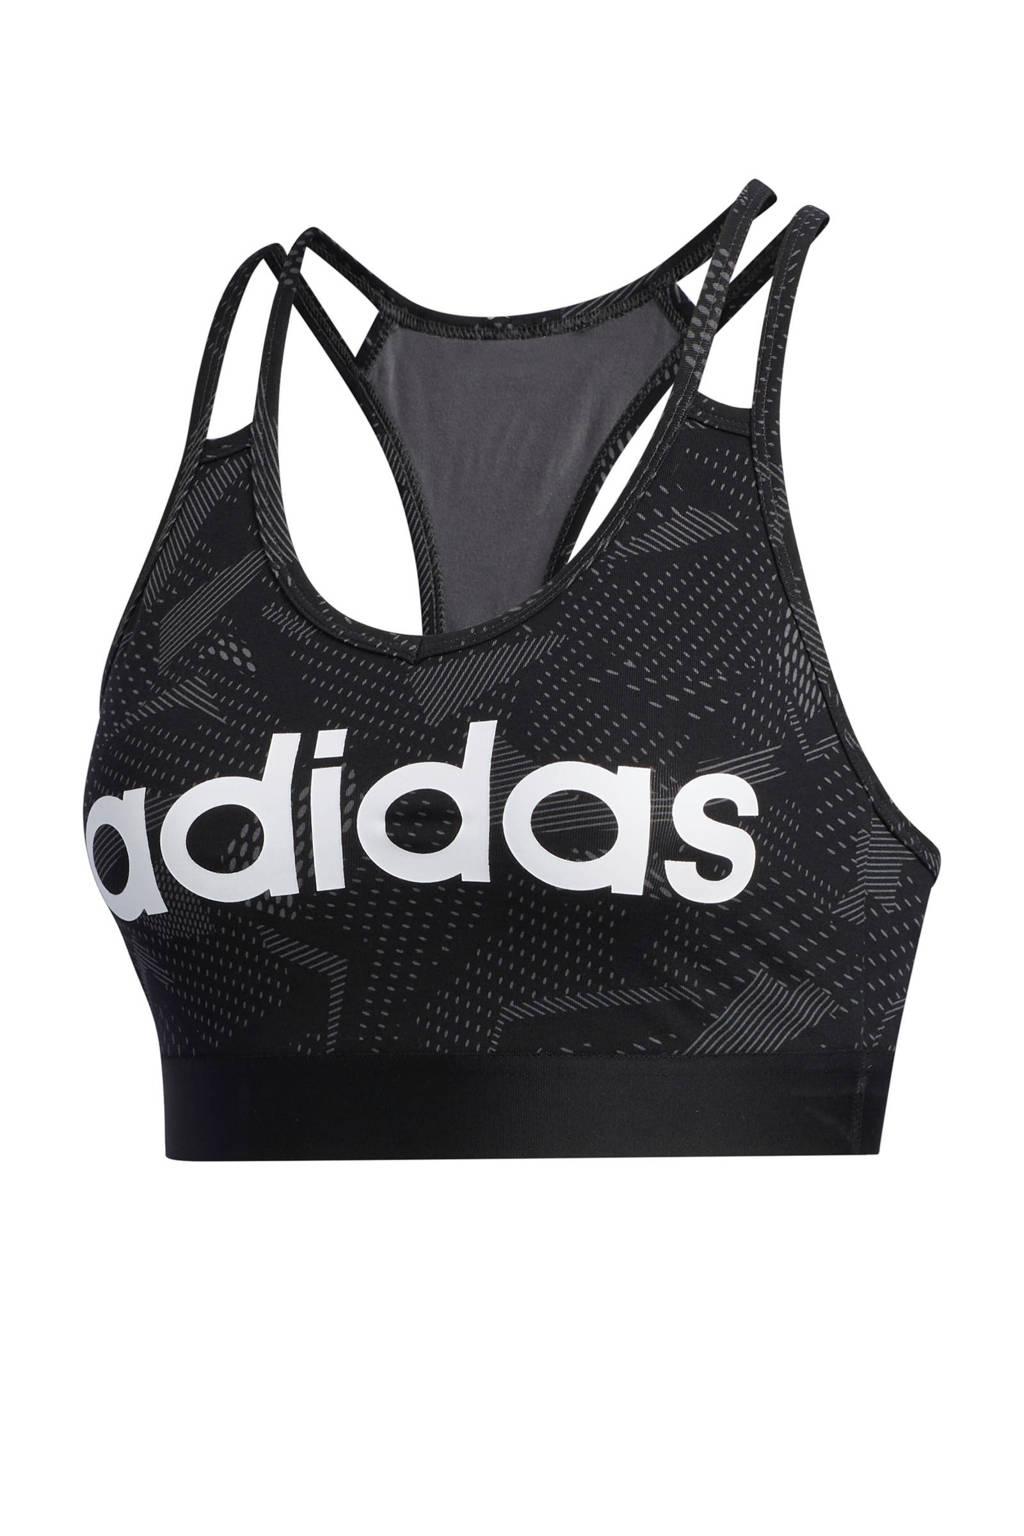 adidas Performance level 1 sportbh zwart, Zwart